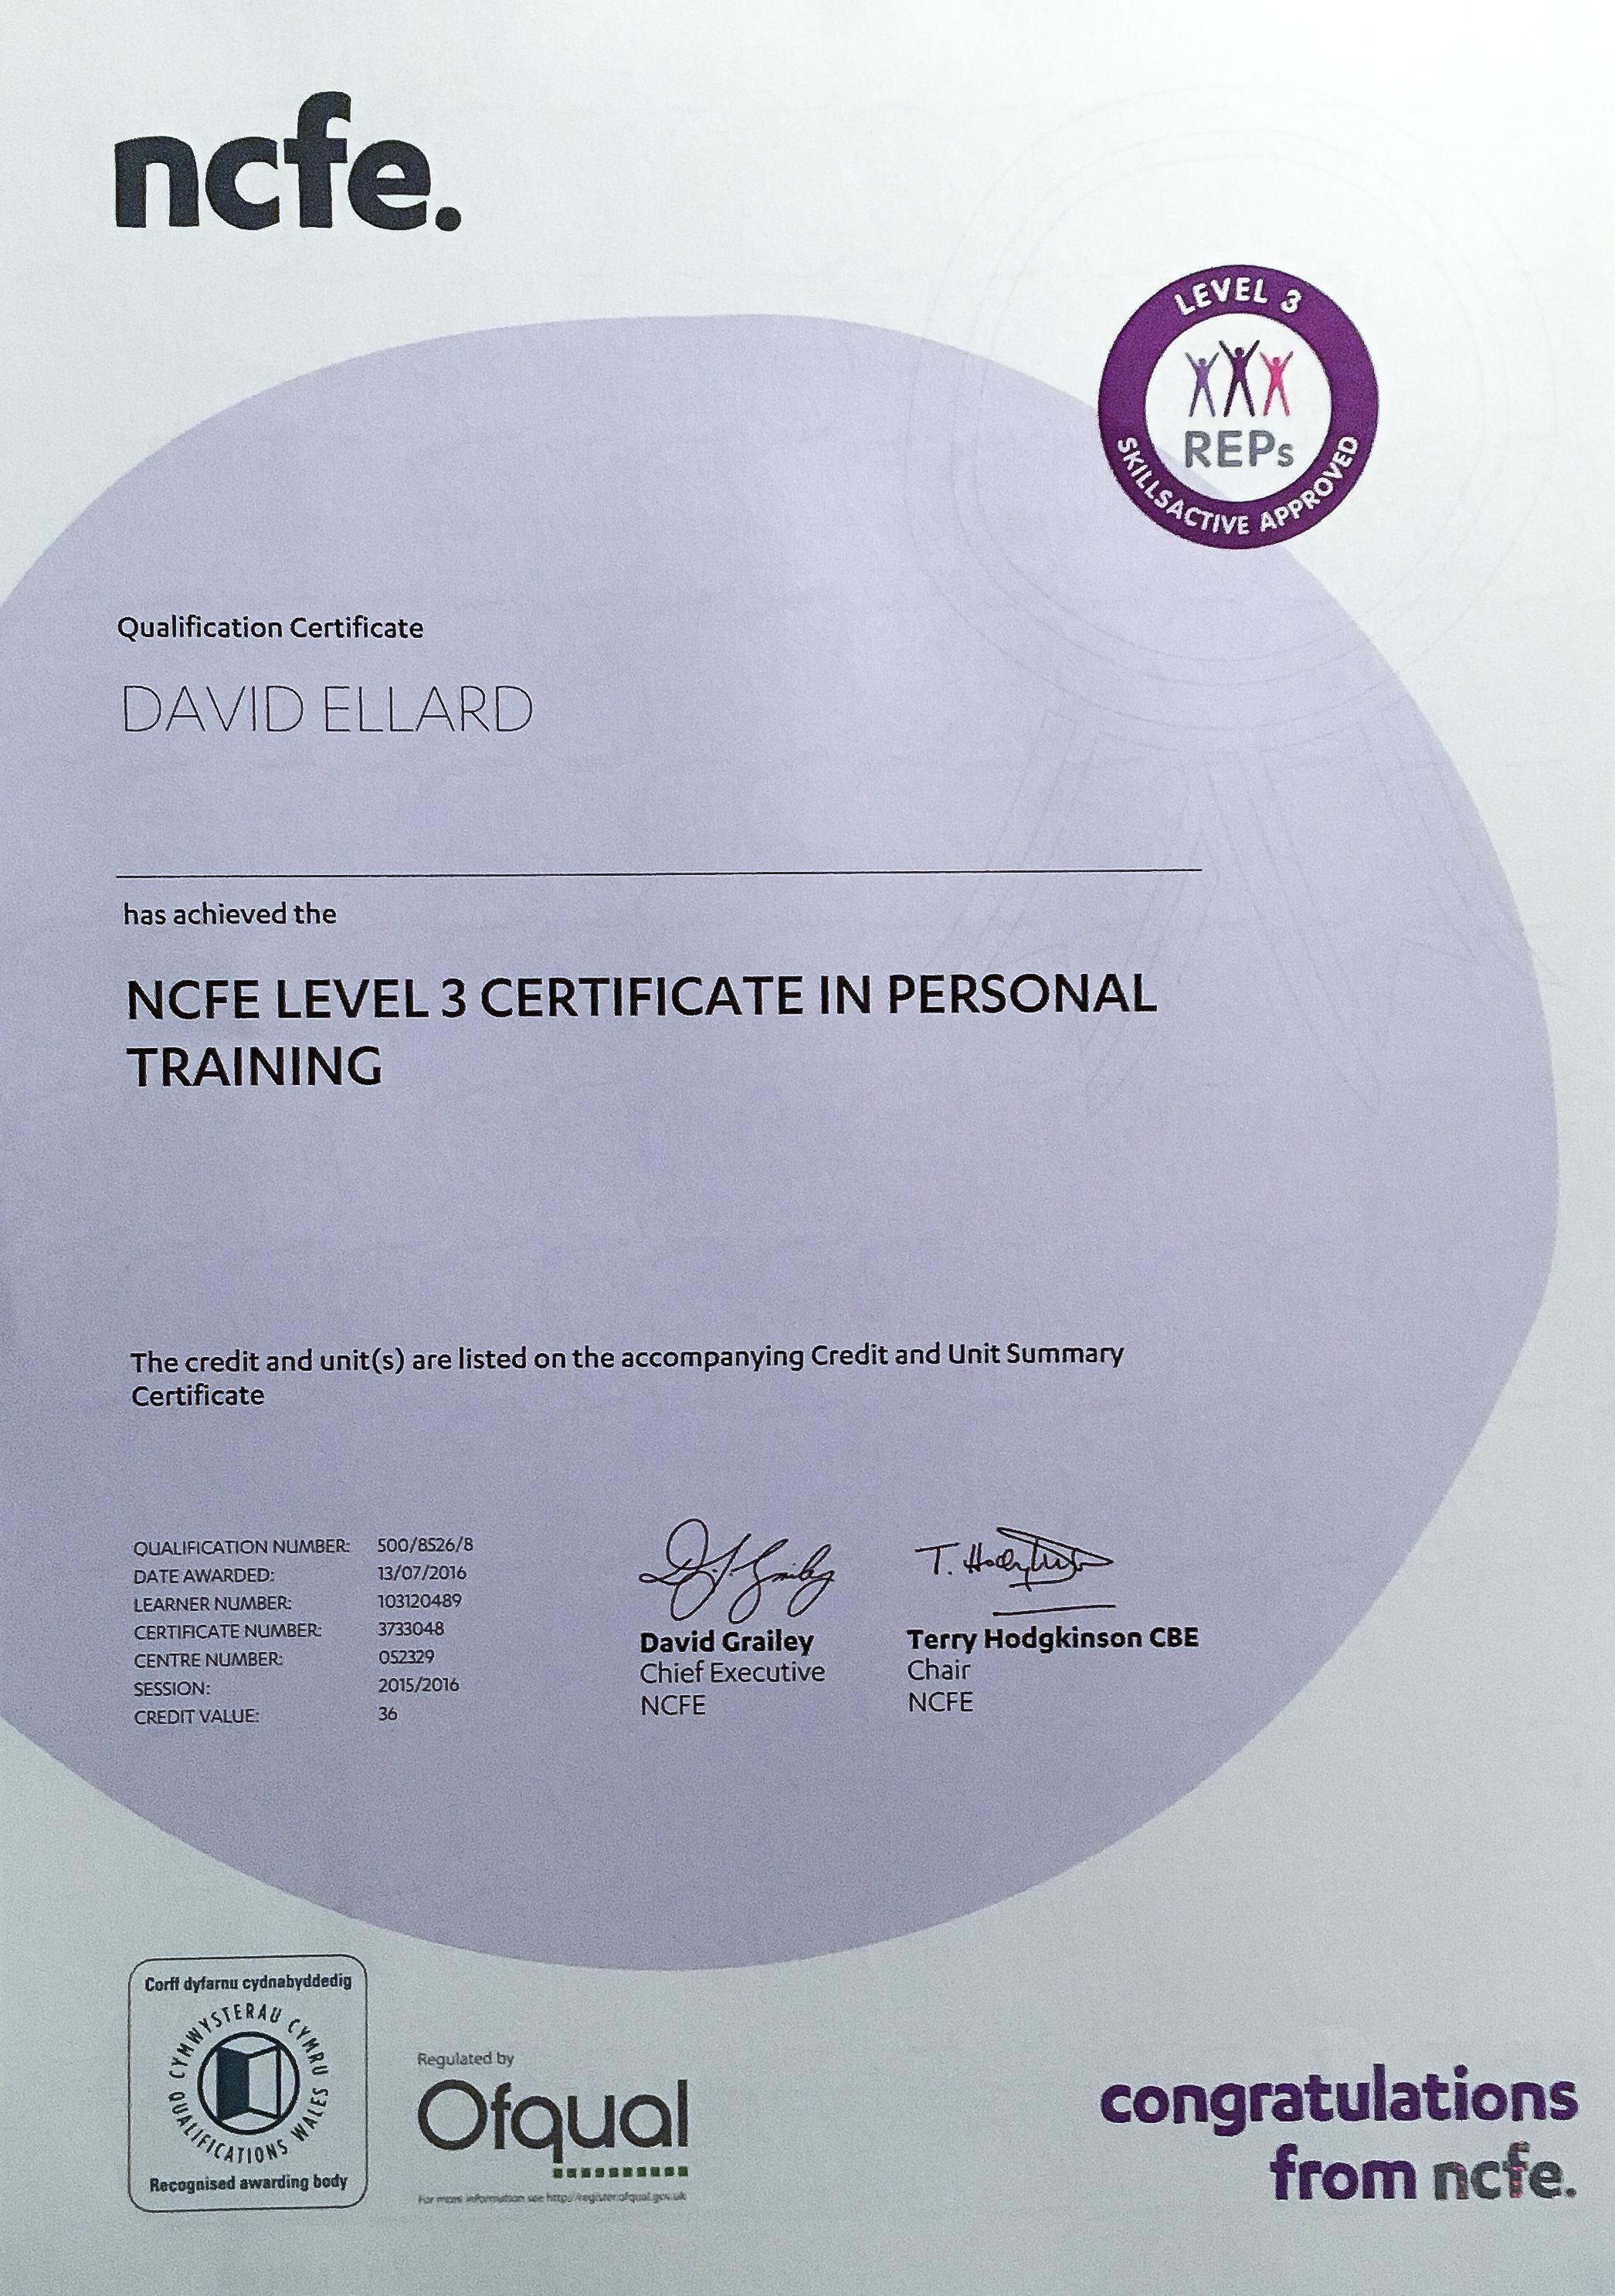 David_Ellard_Personal_Training_Certification